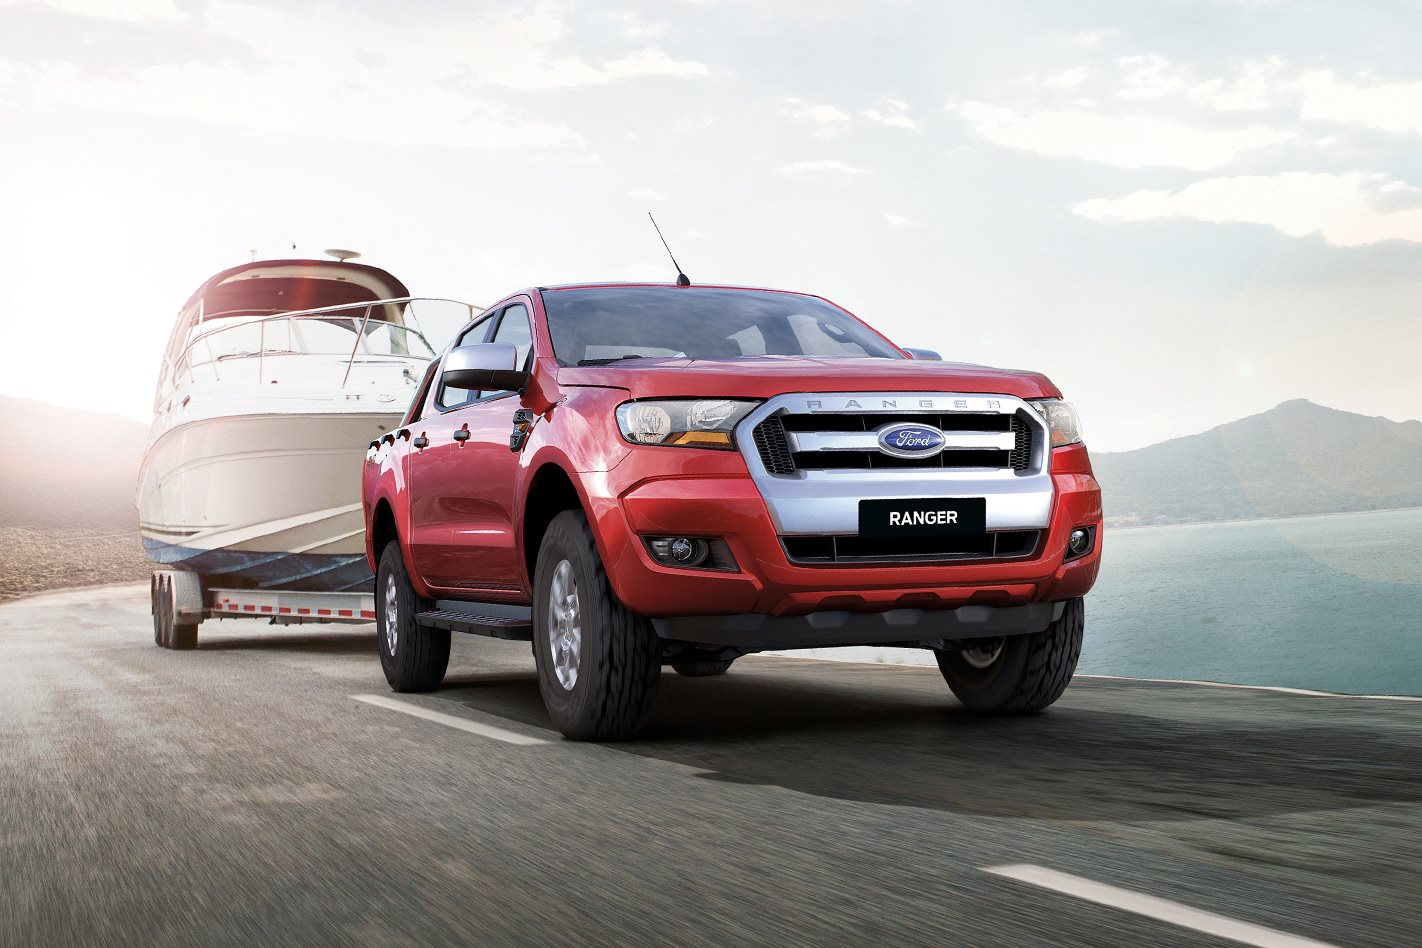 2017 Holden Colorado Vs Ford Ranger >> Ford Ranger vs Holden Colorado vs Mazda BT50: Which dual cab ute should I buy?